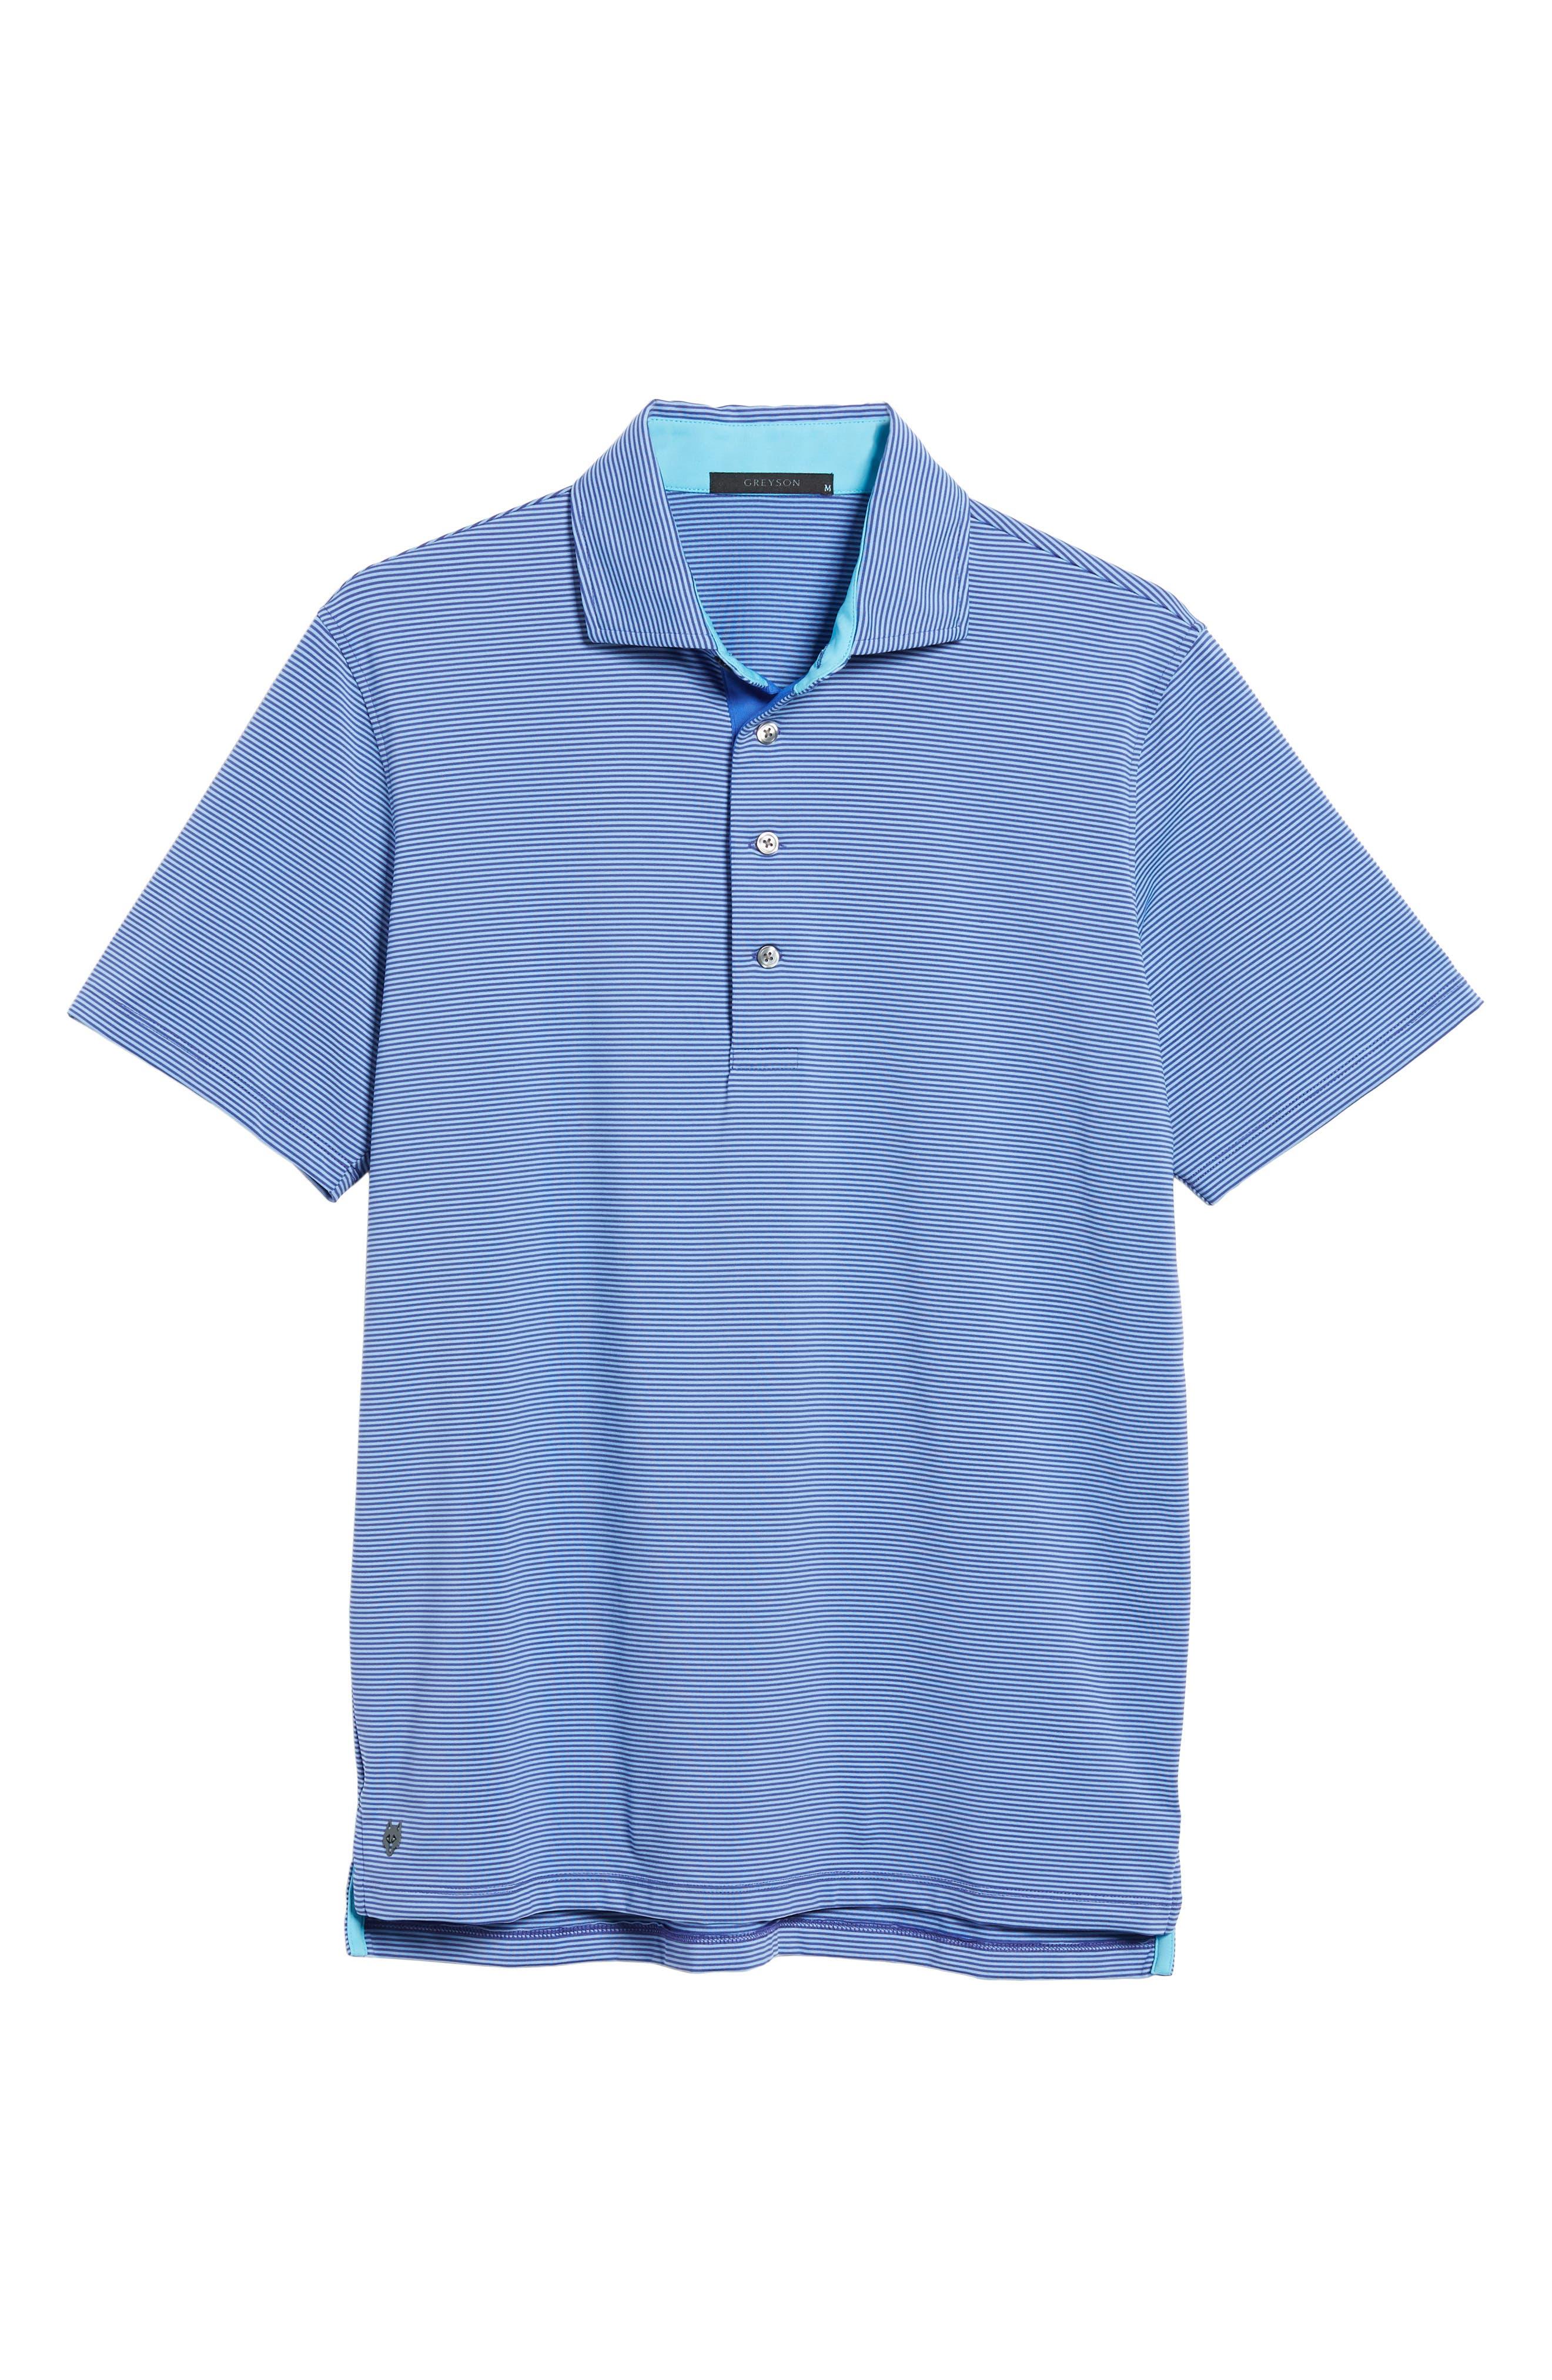 Saranac Jersey Polo,                             Alternate thumbnail 6, color,                             TWILIGHT/ ICE